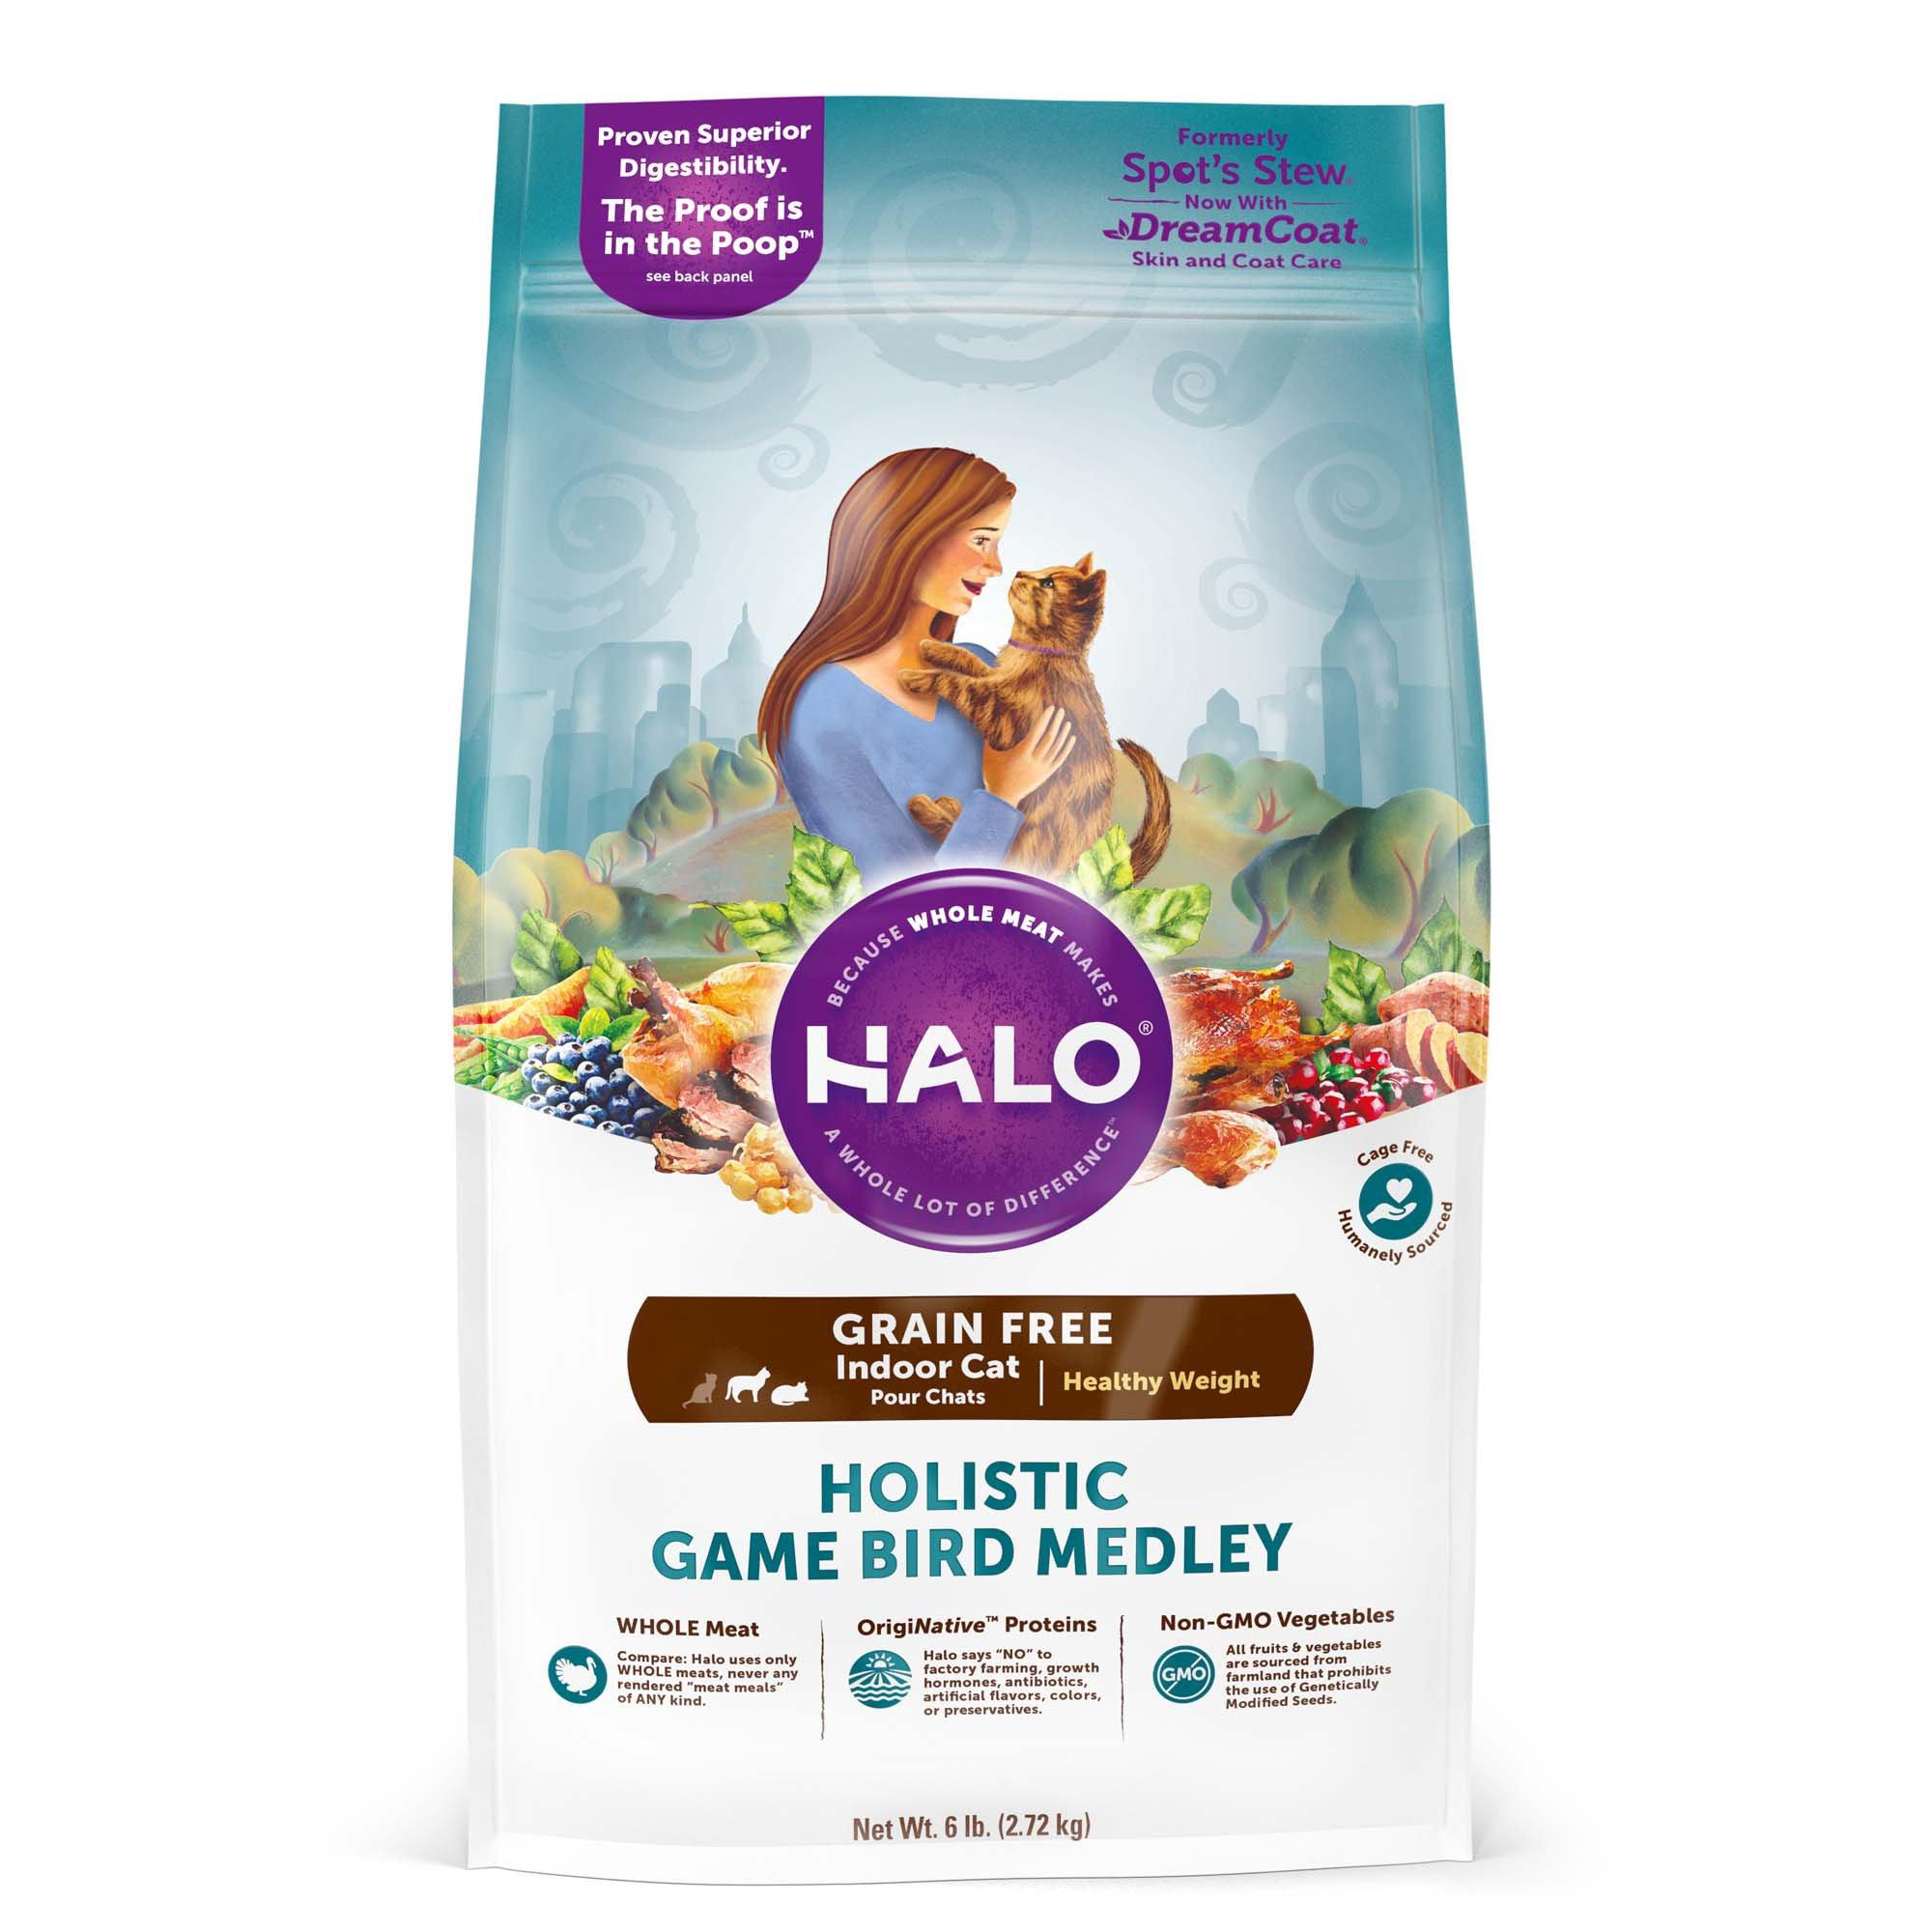 Halo Spot's Stew Healthy Weight Grain Free Game Bird Medley Cat Food